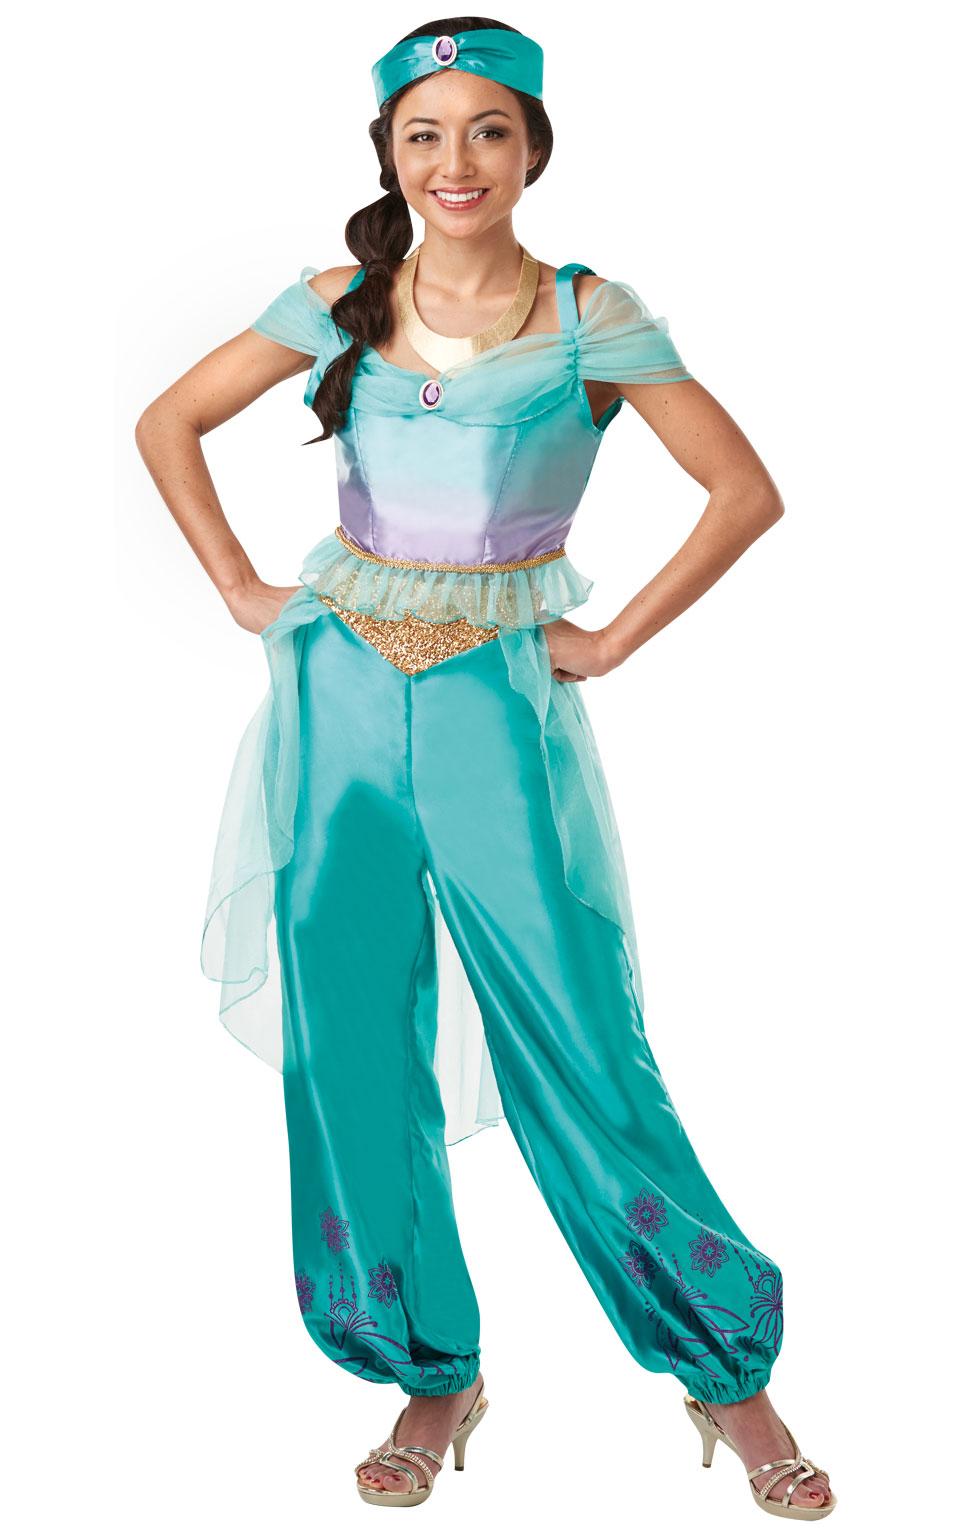 Womens Ladies Jasmine Fancy Dress Costume Outfit Rubies aladdin princess